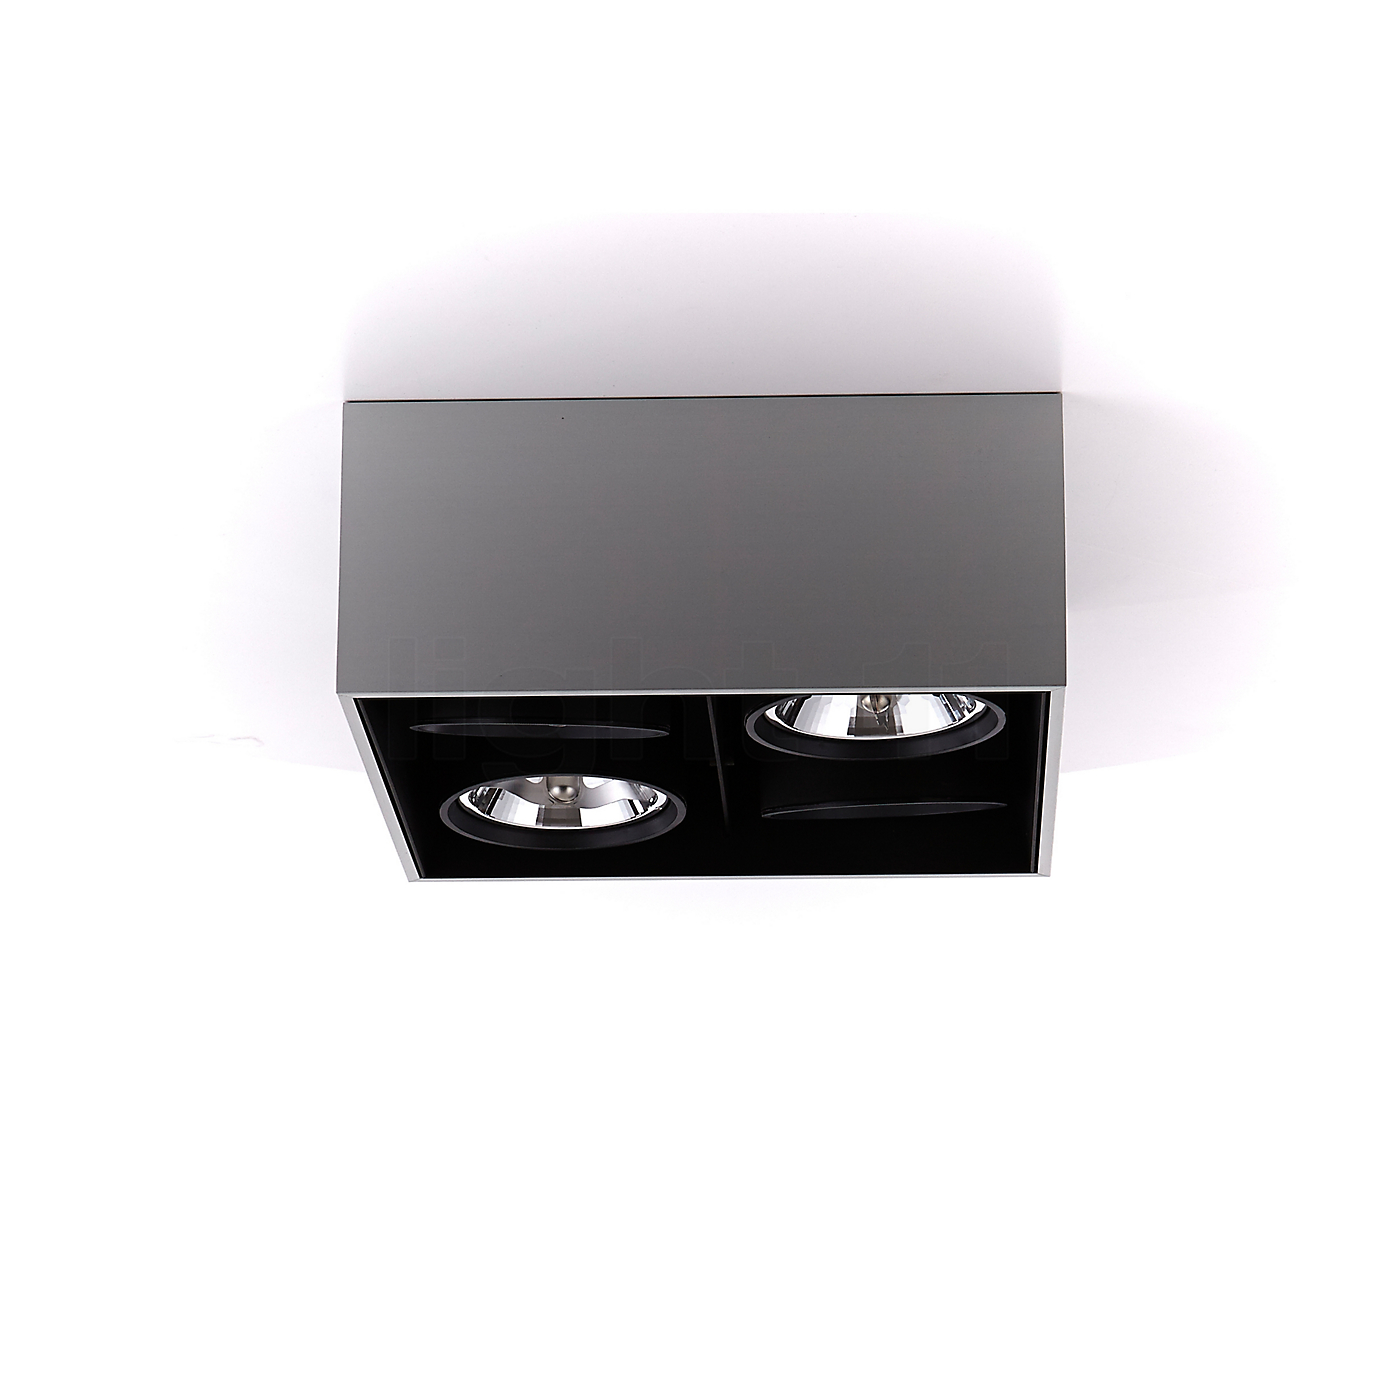 flos compass box square h135 qr111 ceiling lights. Black Bedroom Furniture Sets. Home Design Ideas